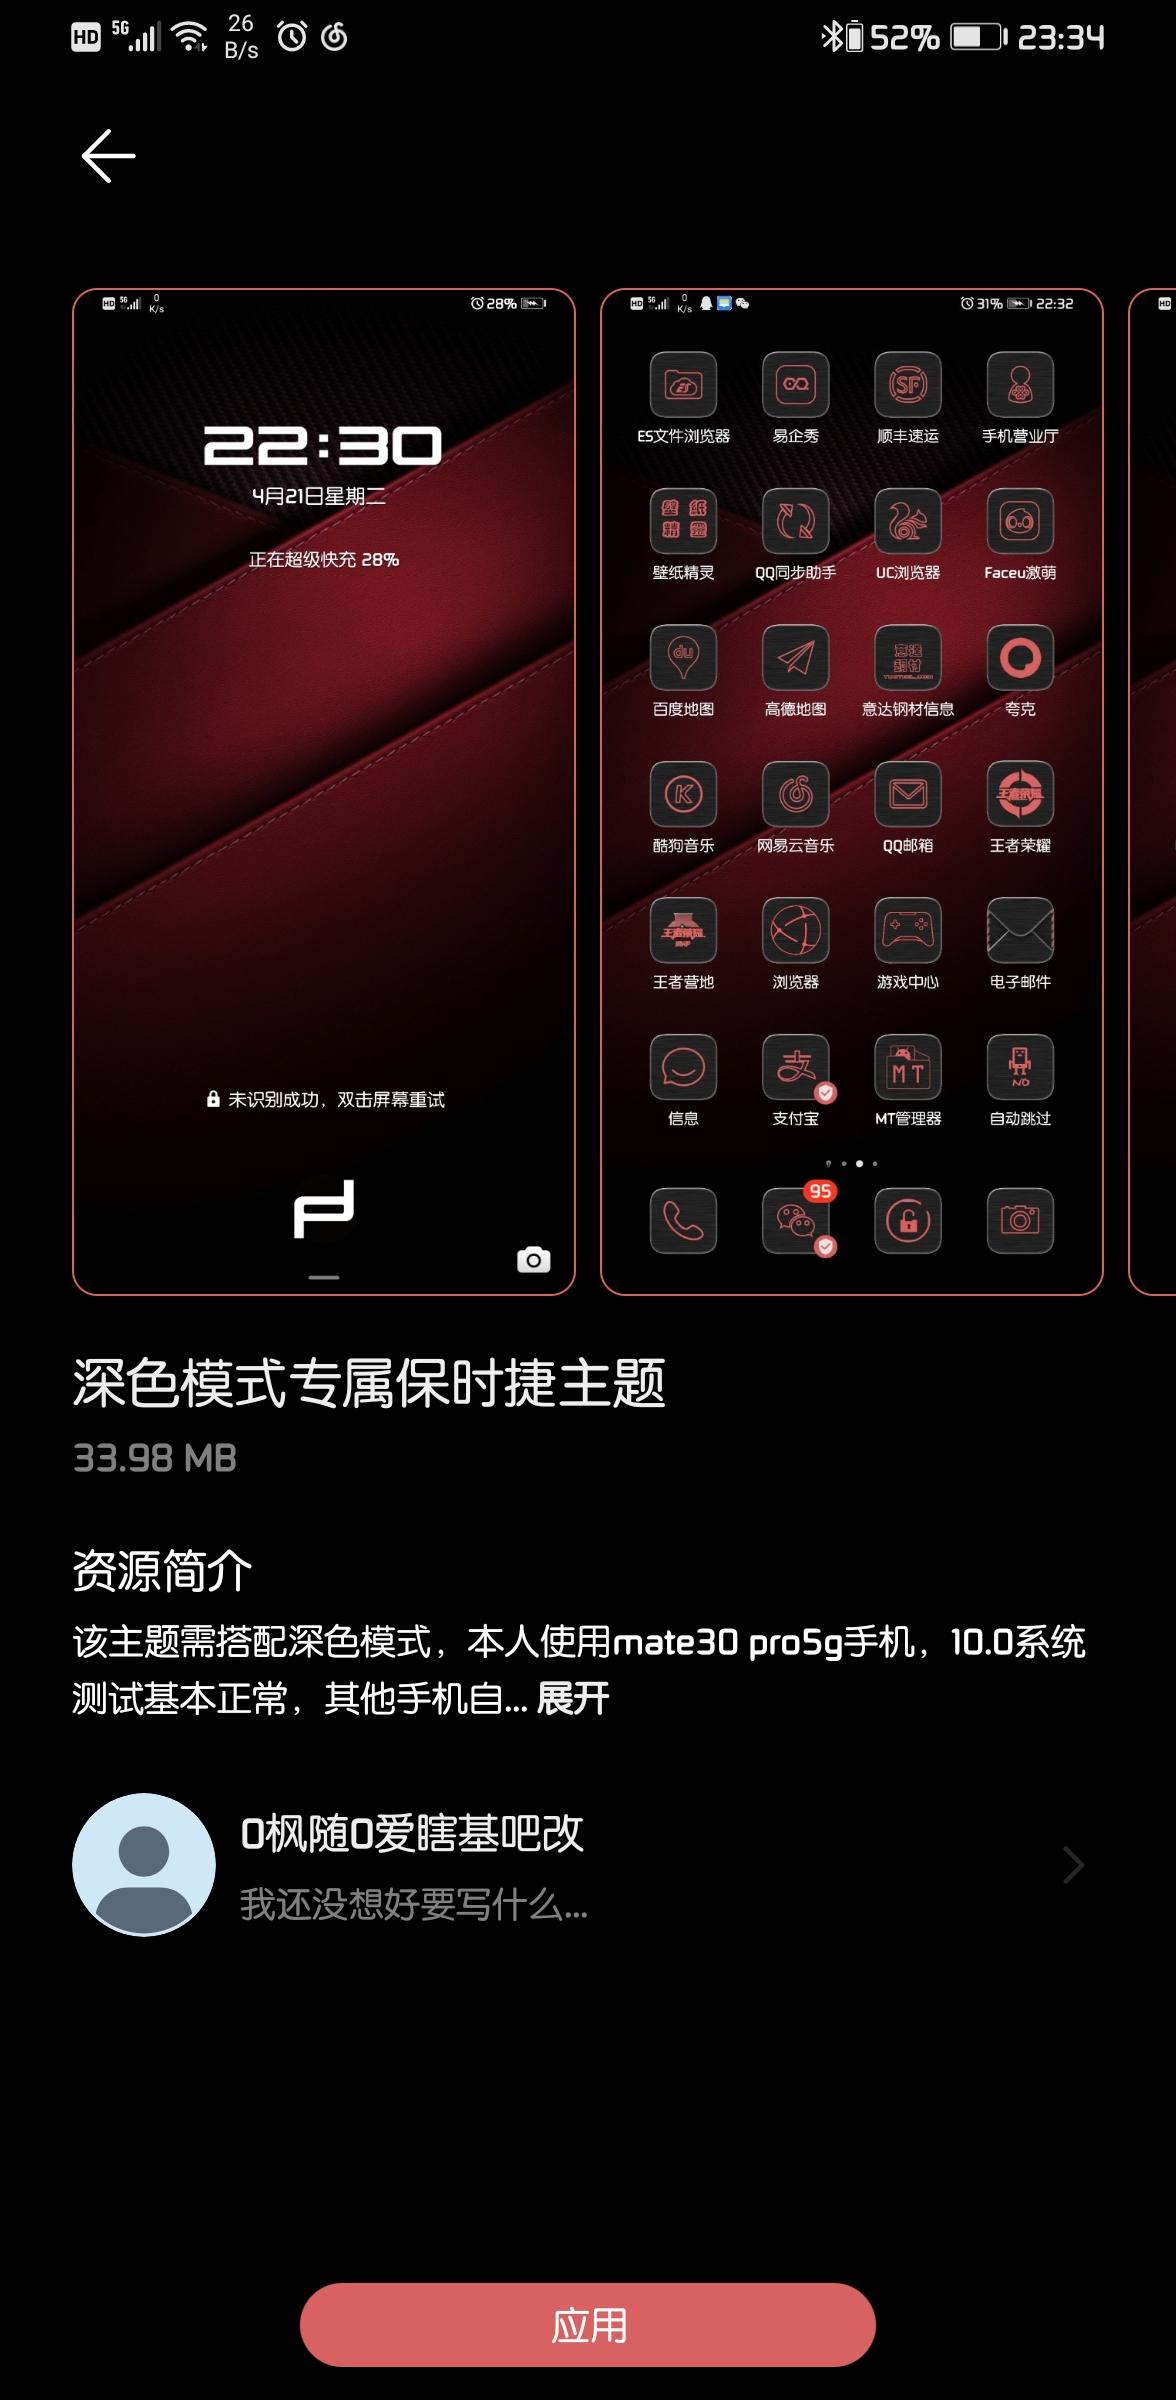 Screenshot_20200421_233409_com.huawei.android.thememanager.jpg